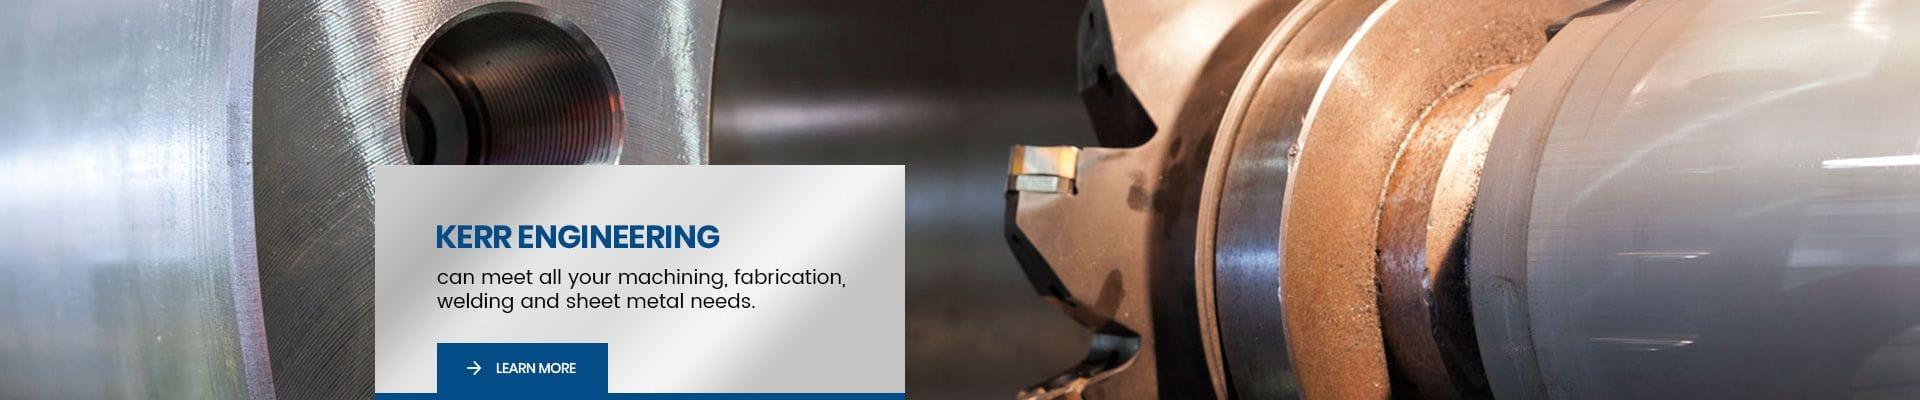 Kerr Engineering | Machining Services